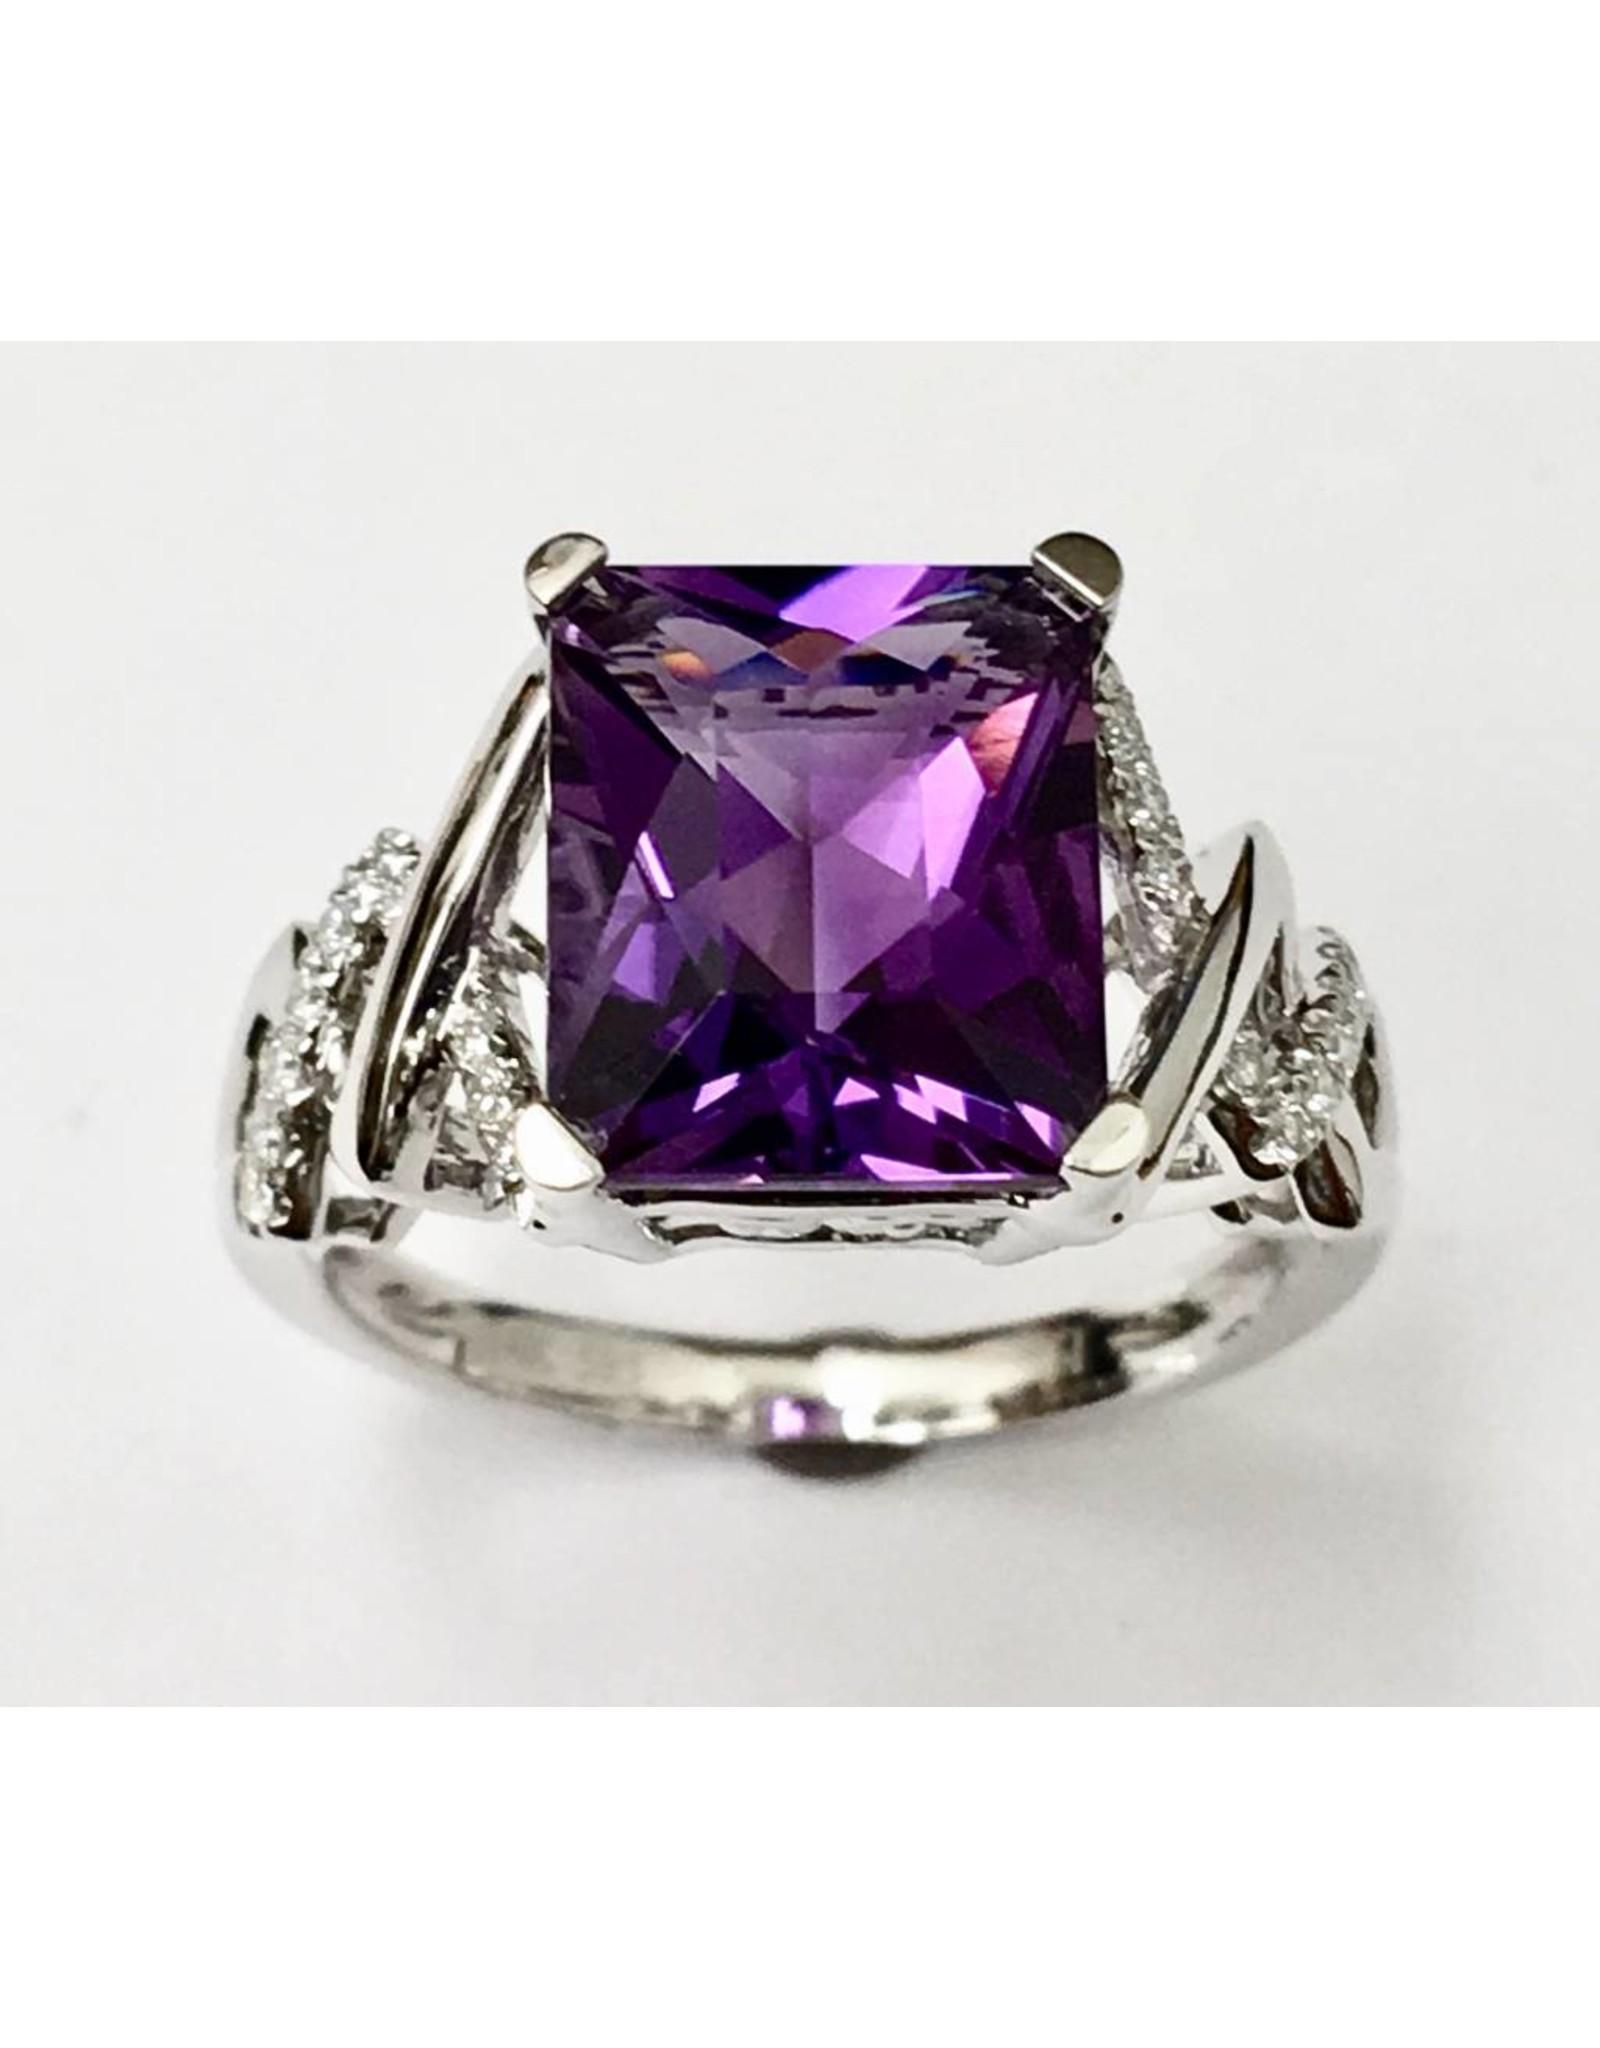 4.15ct Amethyst & Diamond Ring 14KW